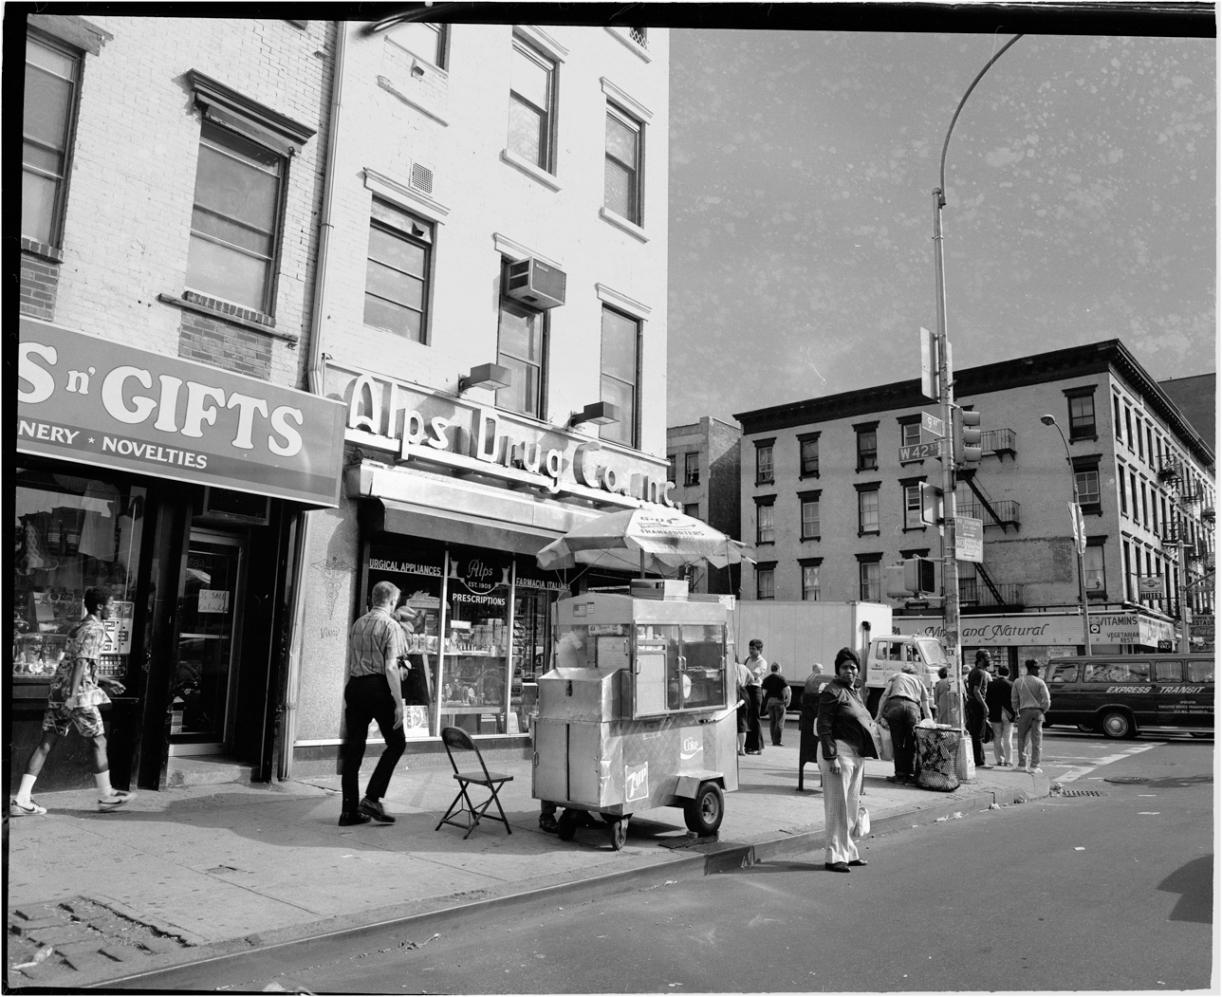 42d-Street-9thAve-1986 copy